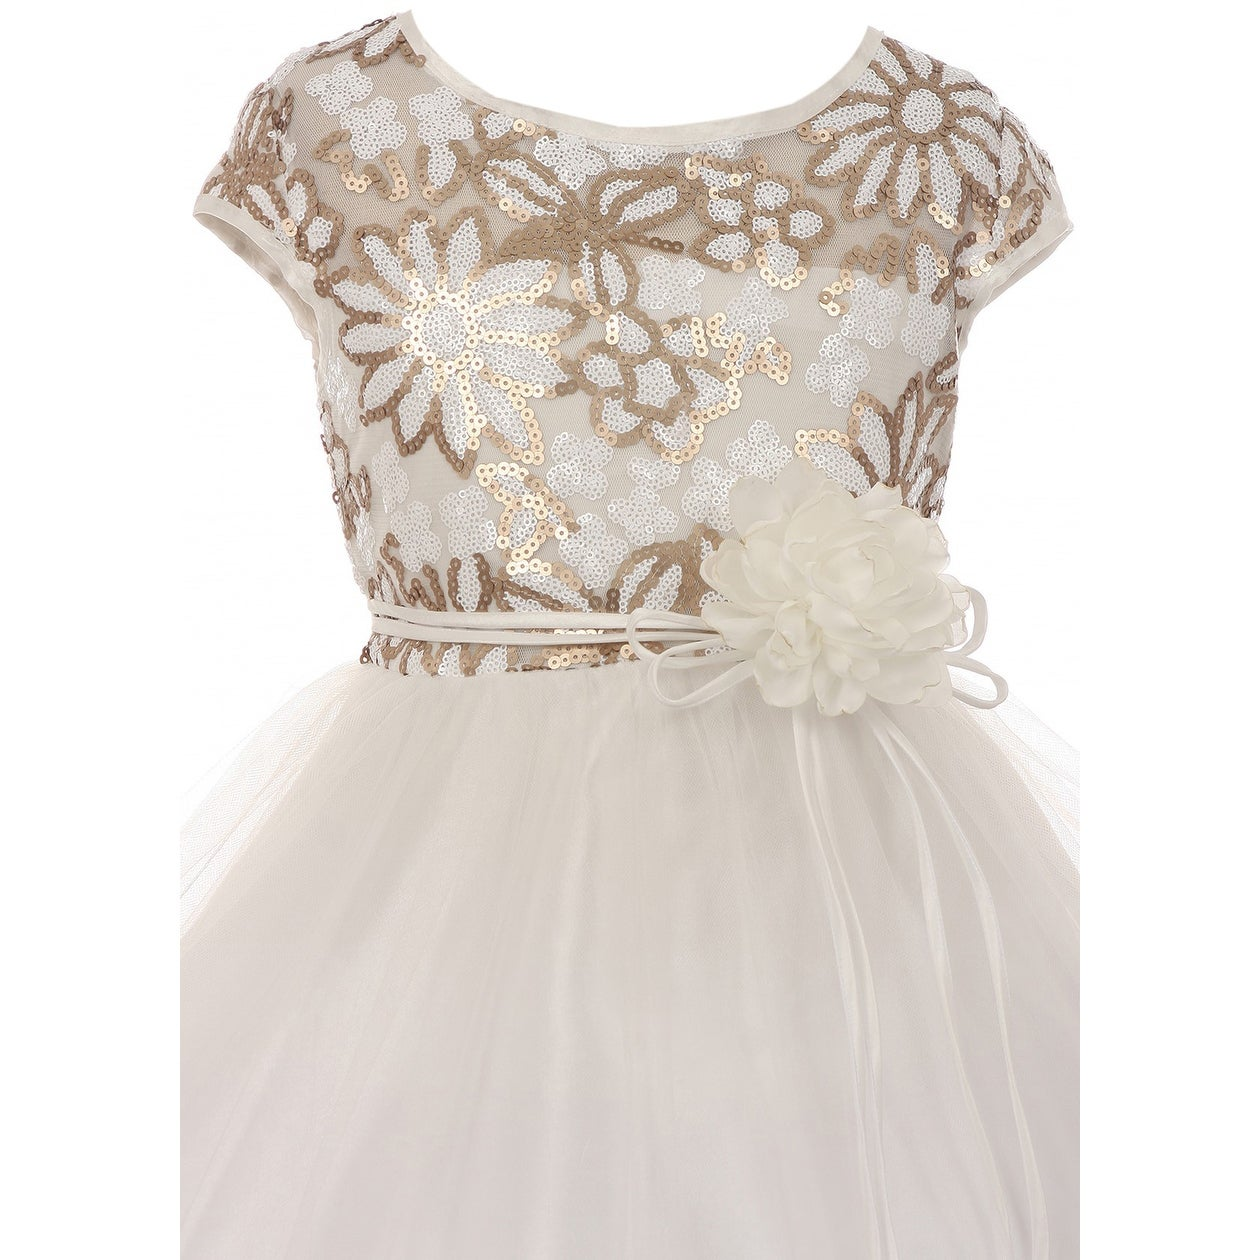 Shop Neckline Floral Sequin Pageant Flower Girl Dress Off White Jks